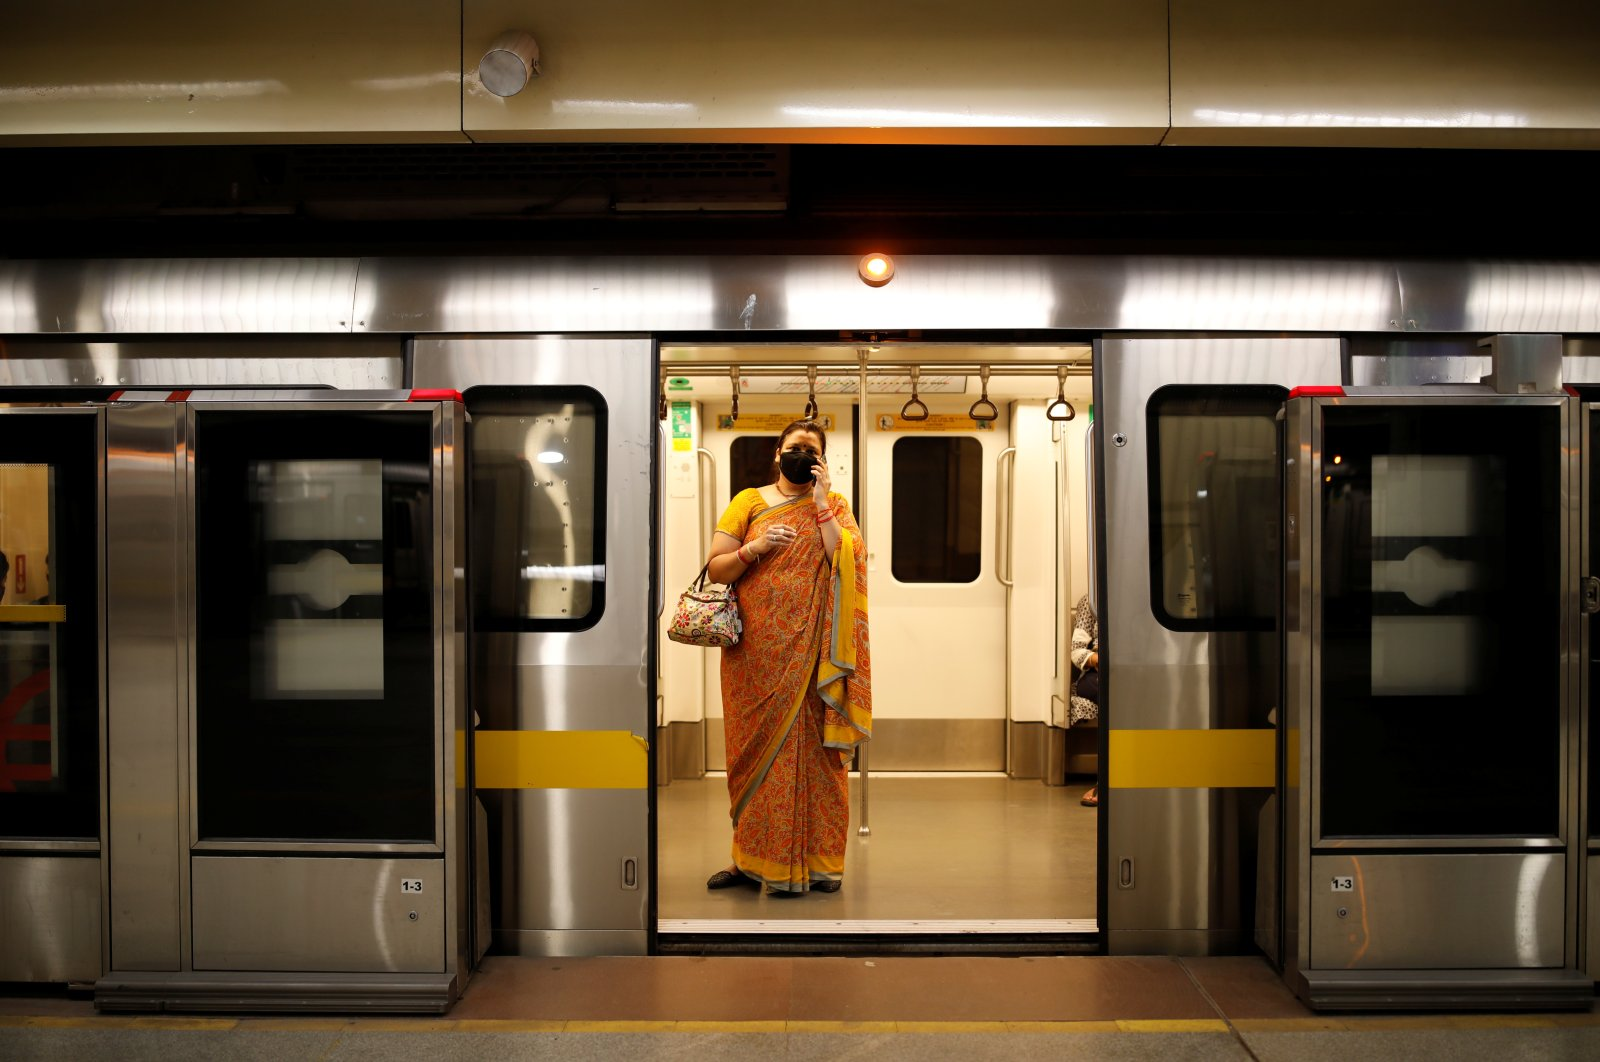 A passenger wearing a face mask takes a train at a Delhi metro station, New Delhi, India, Sept. 7, 2020. (Reuters Photo)